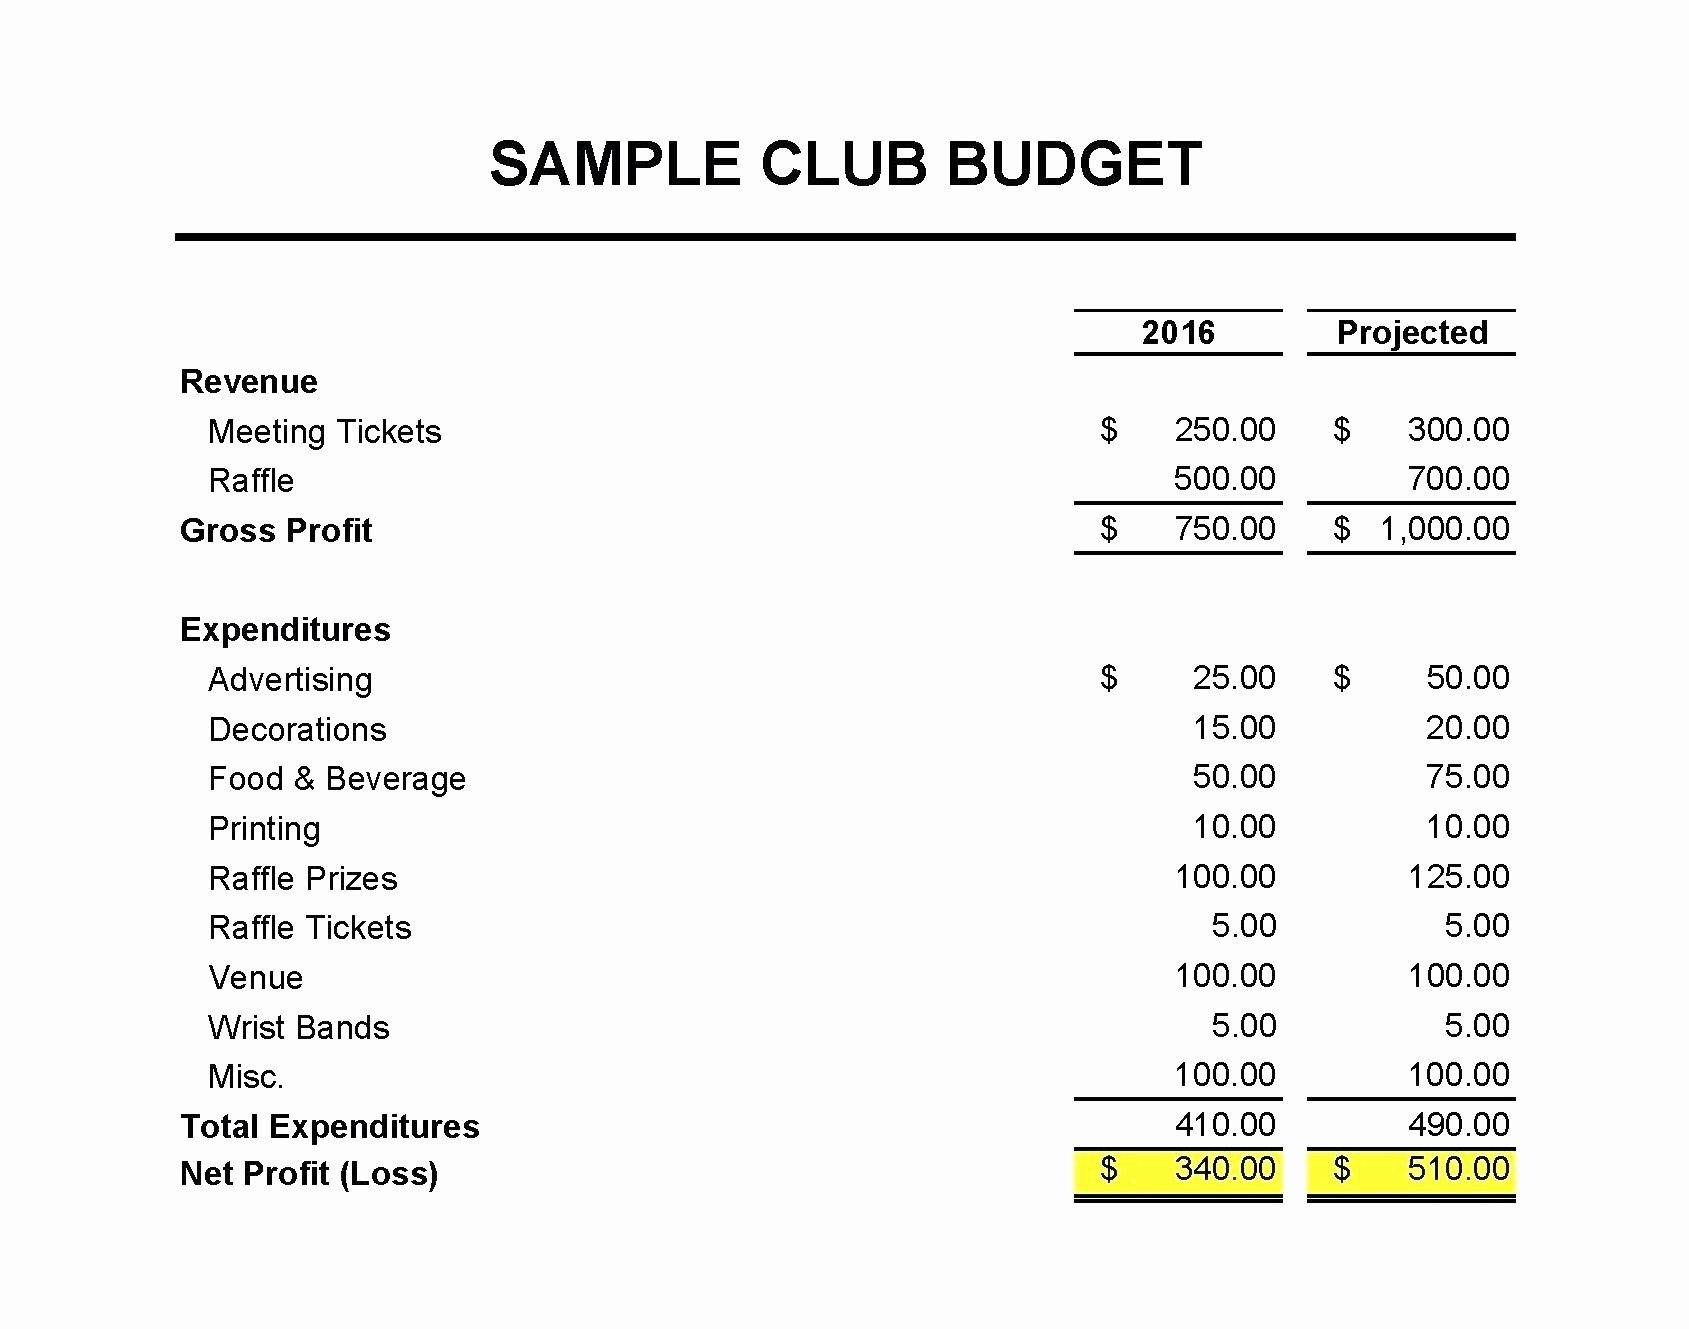 Treasurer Report Template Non Profit Lovely Of Ideas Outstanding Regarding Treasurer Report Template Non Profit